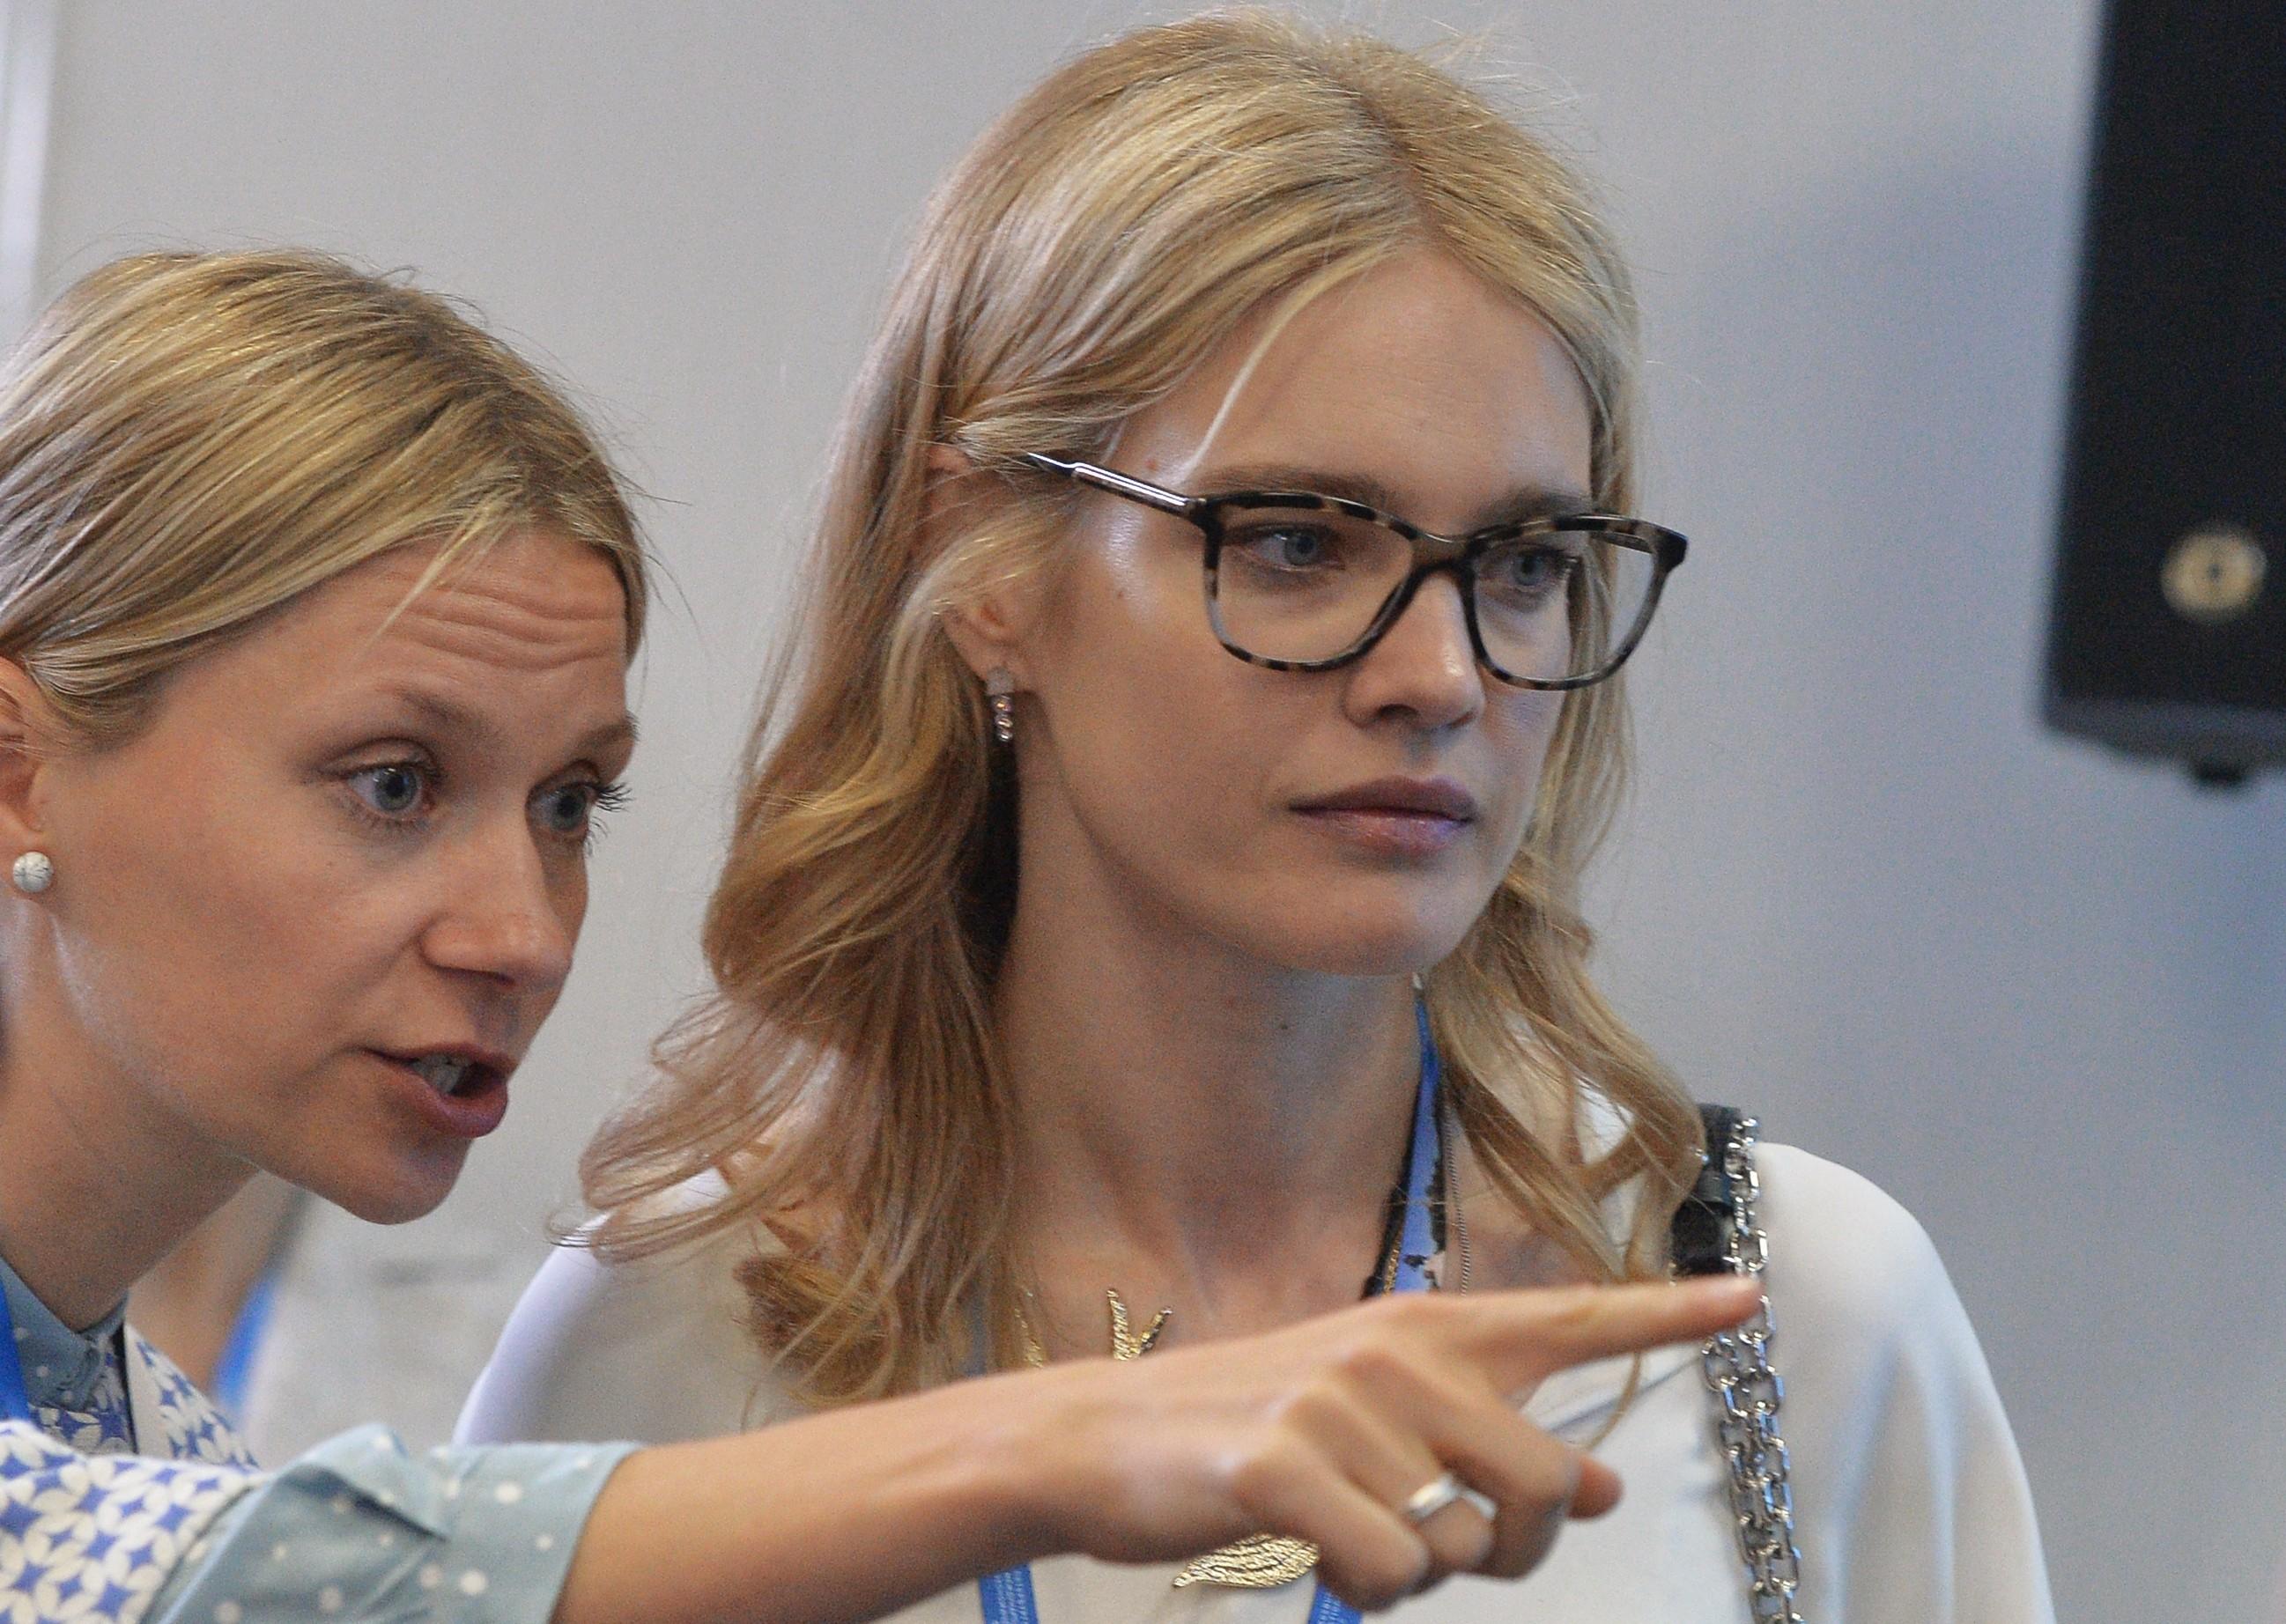 <p><span>Фото: &copy;РИА Новости/Алексей Куденко</span></p>